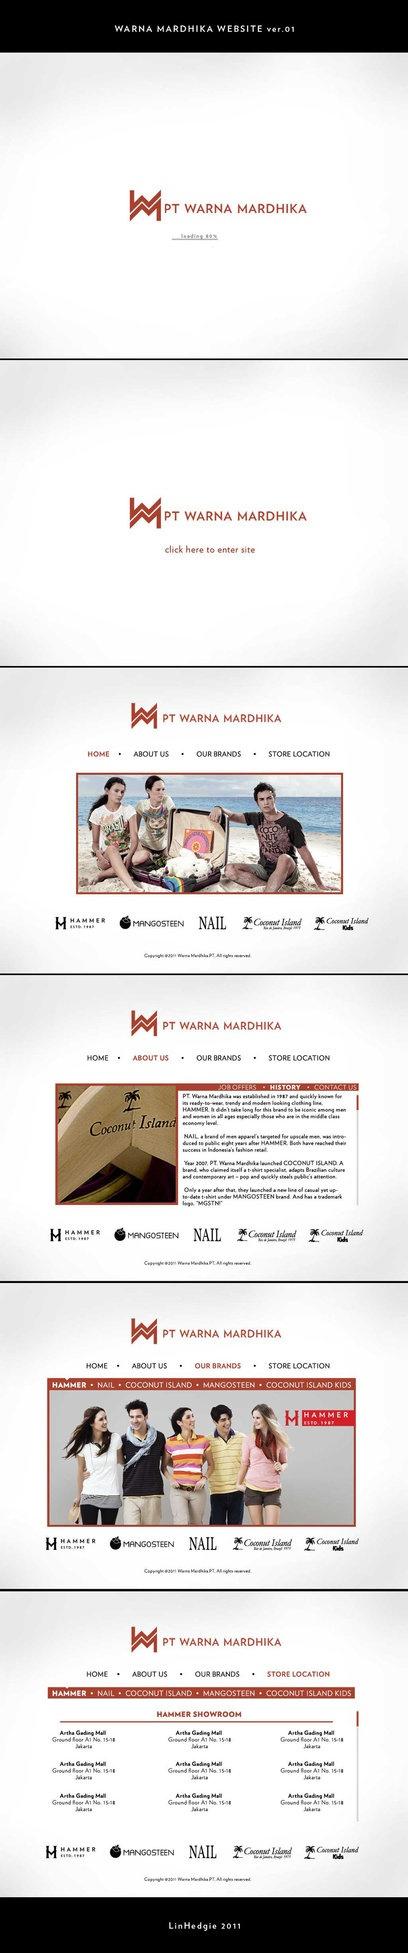 Warna Mardhika website 2nd concept